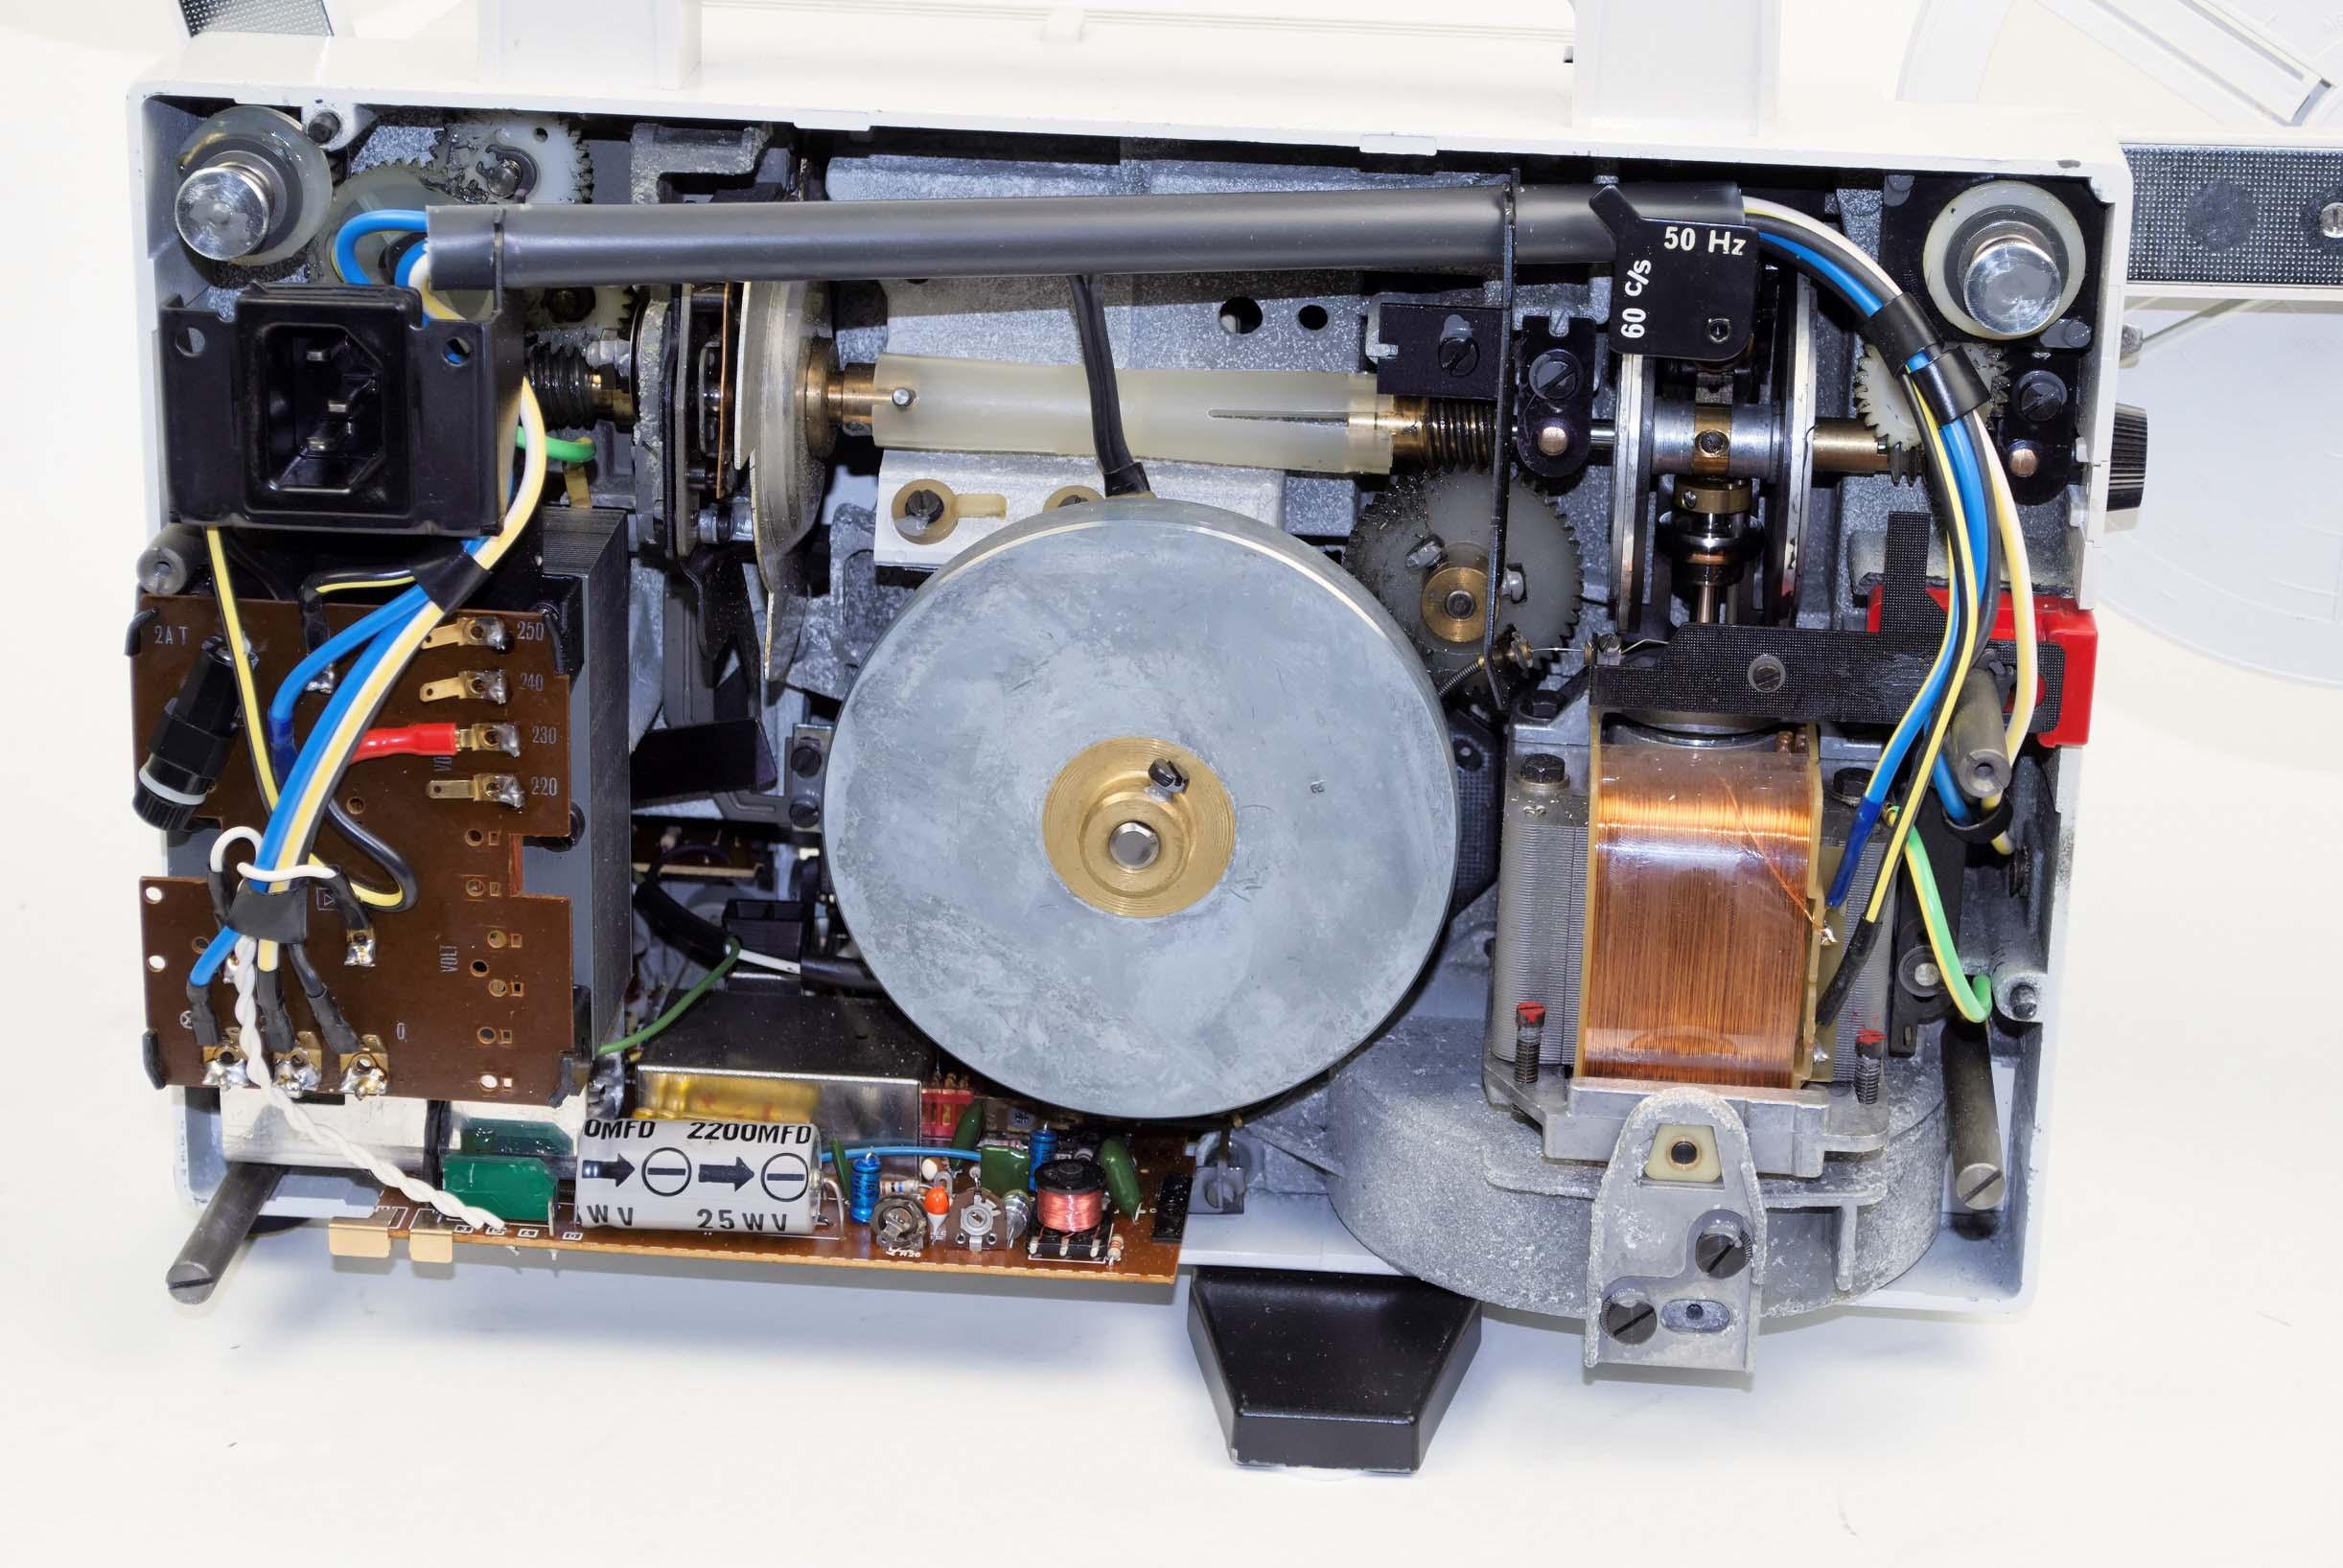 Eumig Mark S 807 D, Film Projectors - Spare Parts and Information Van Eck  Video Services